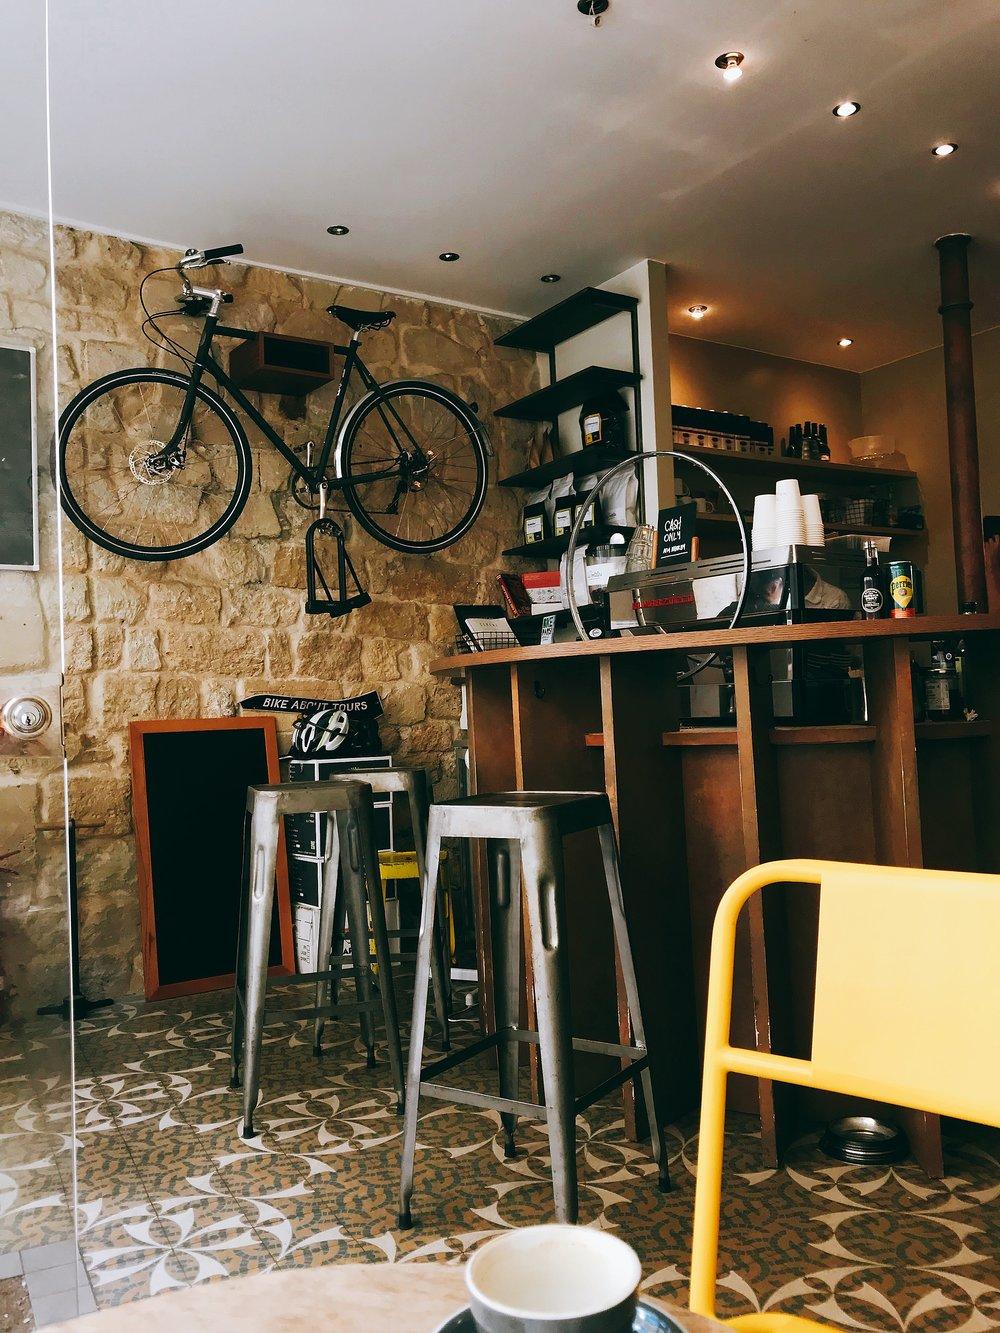 Le Peleton Cafe's interior.